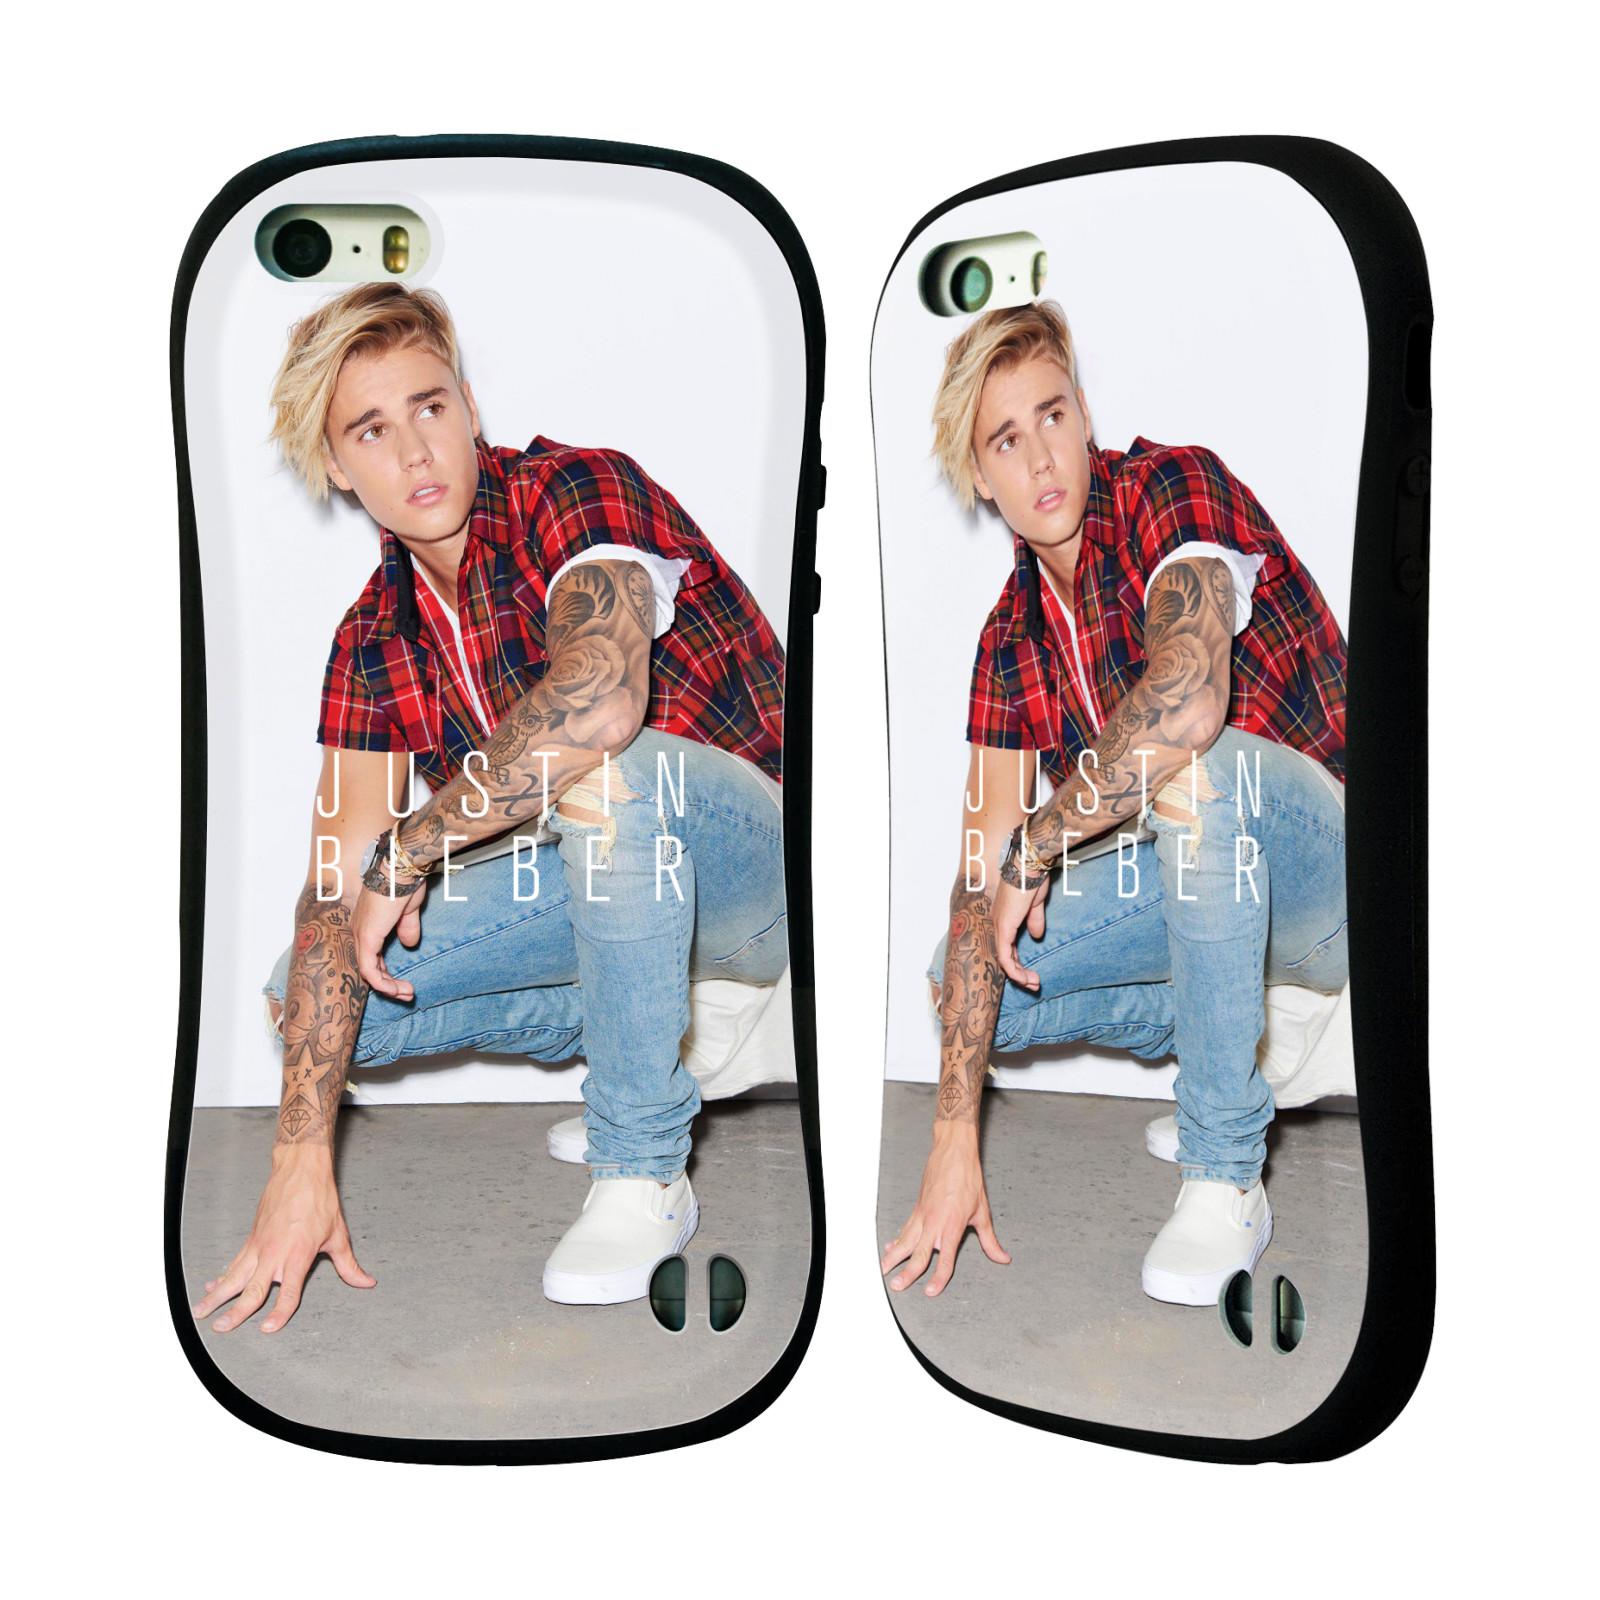 HEAD CASE silikon/plast odolný obal na mobil Apple Iphone 5 / 5S originální potisk Justin Bieber Uncropped